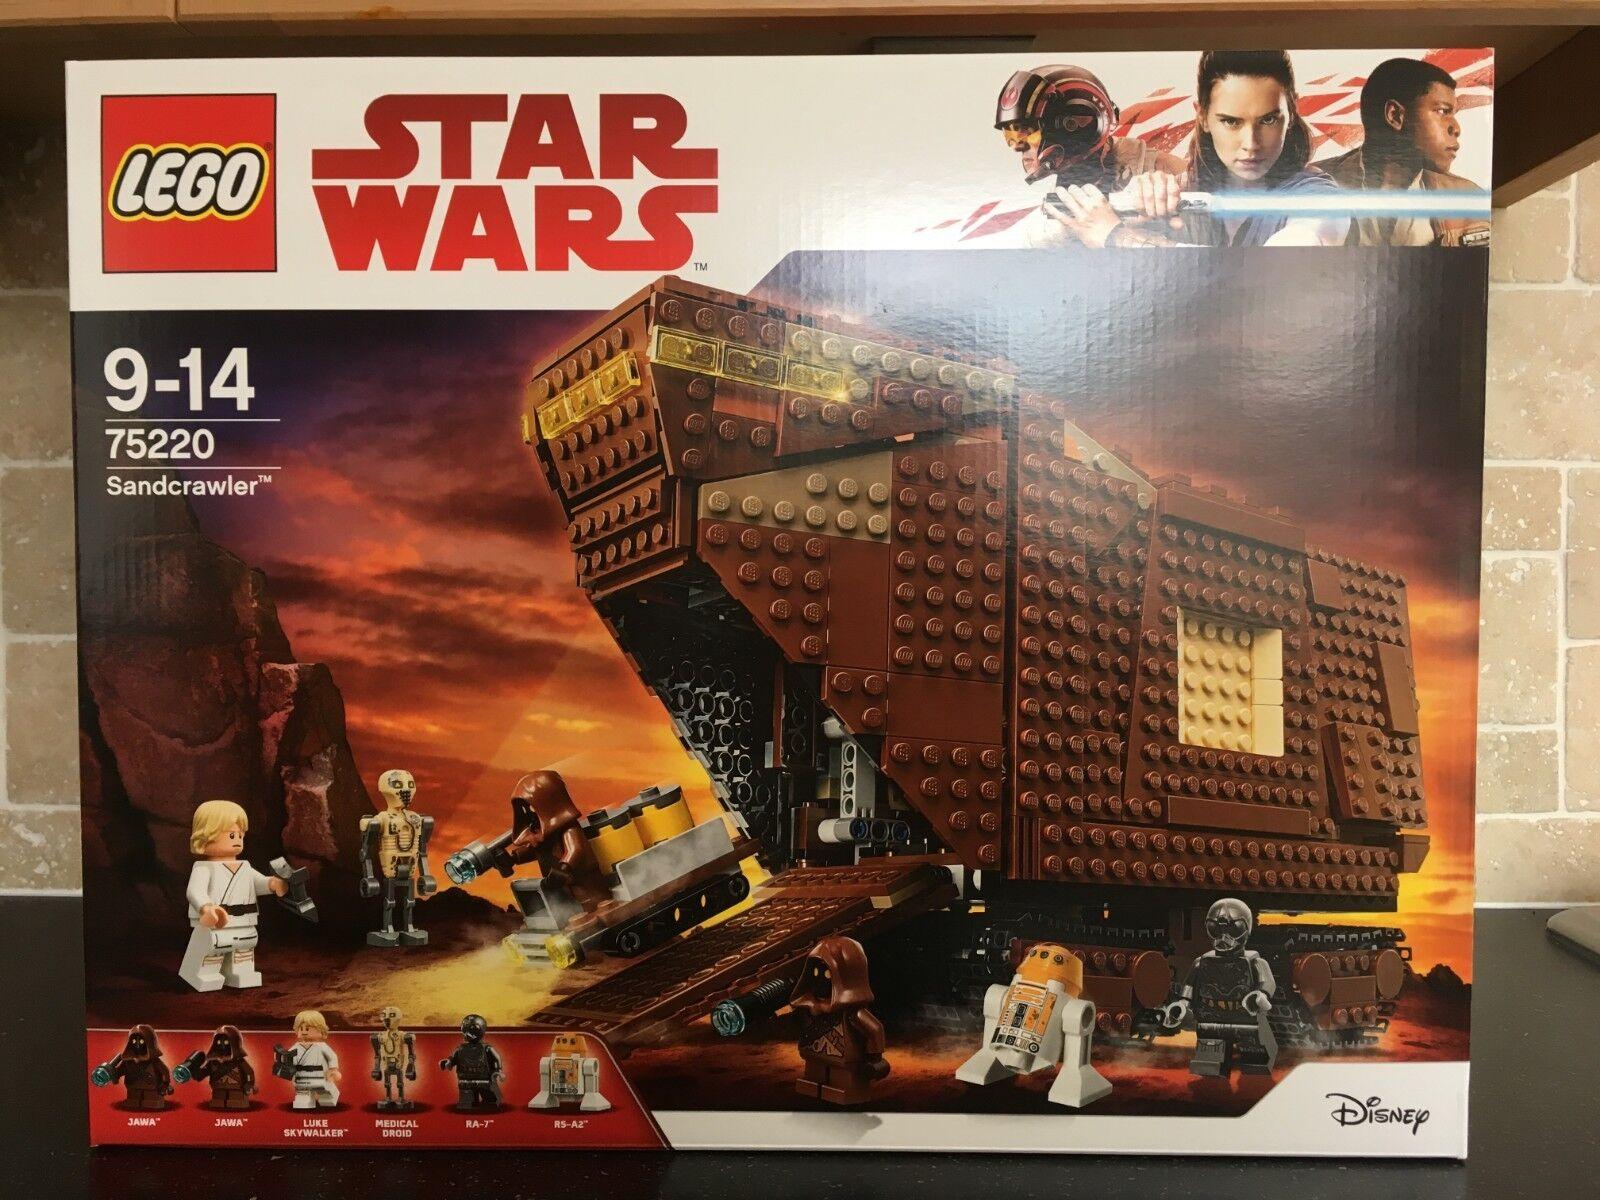 Lego STAR WARS - 75220 Sandcrawler Brand New & Sealed